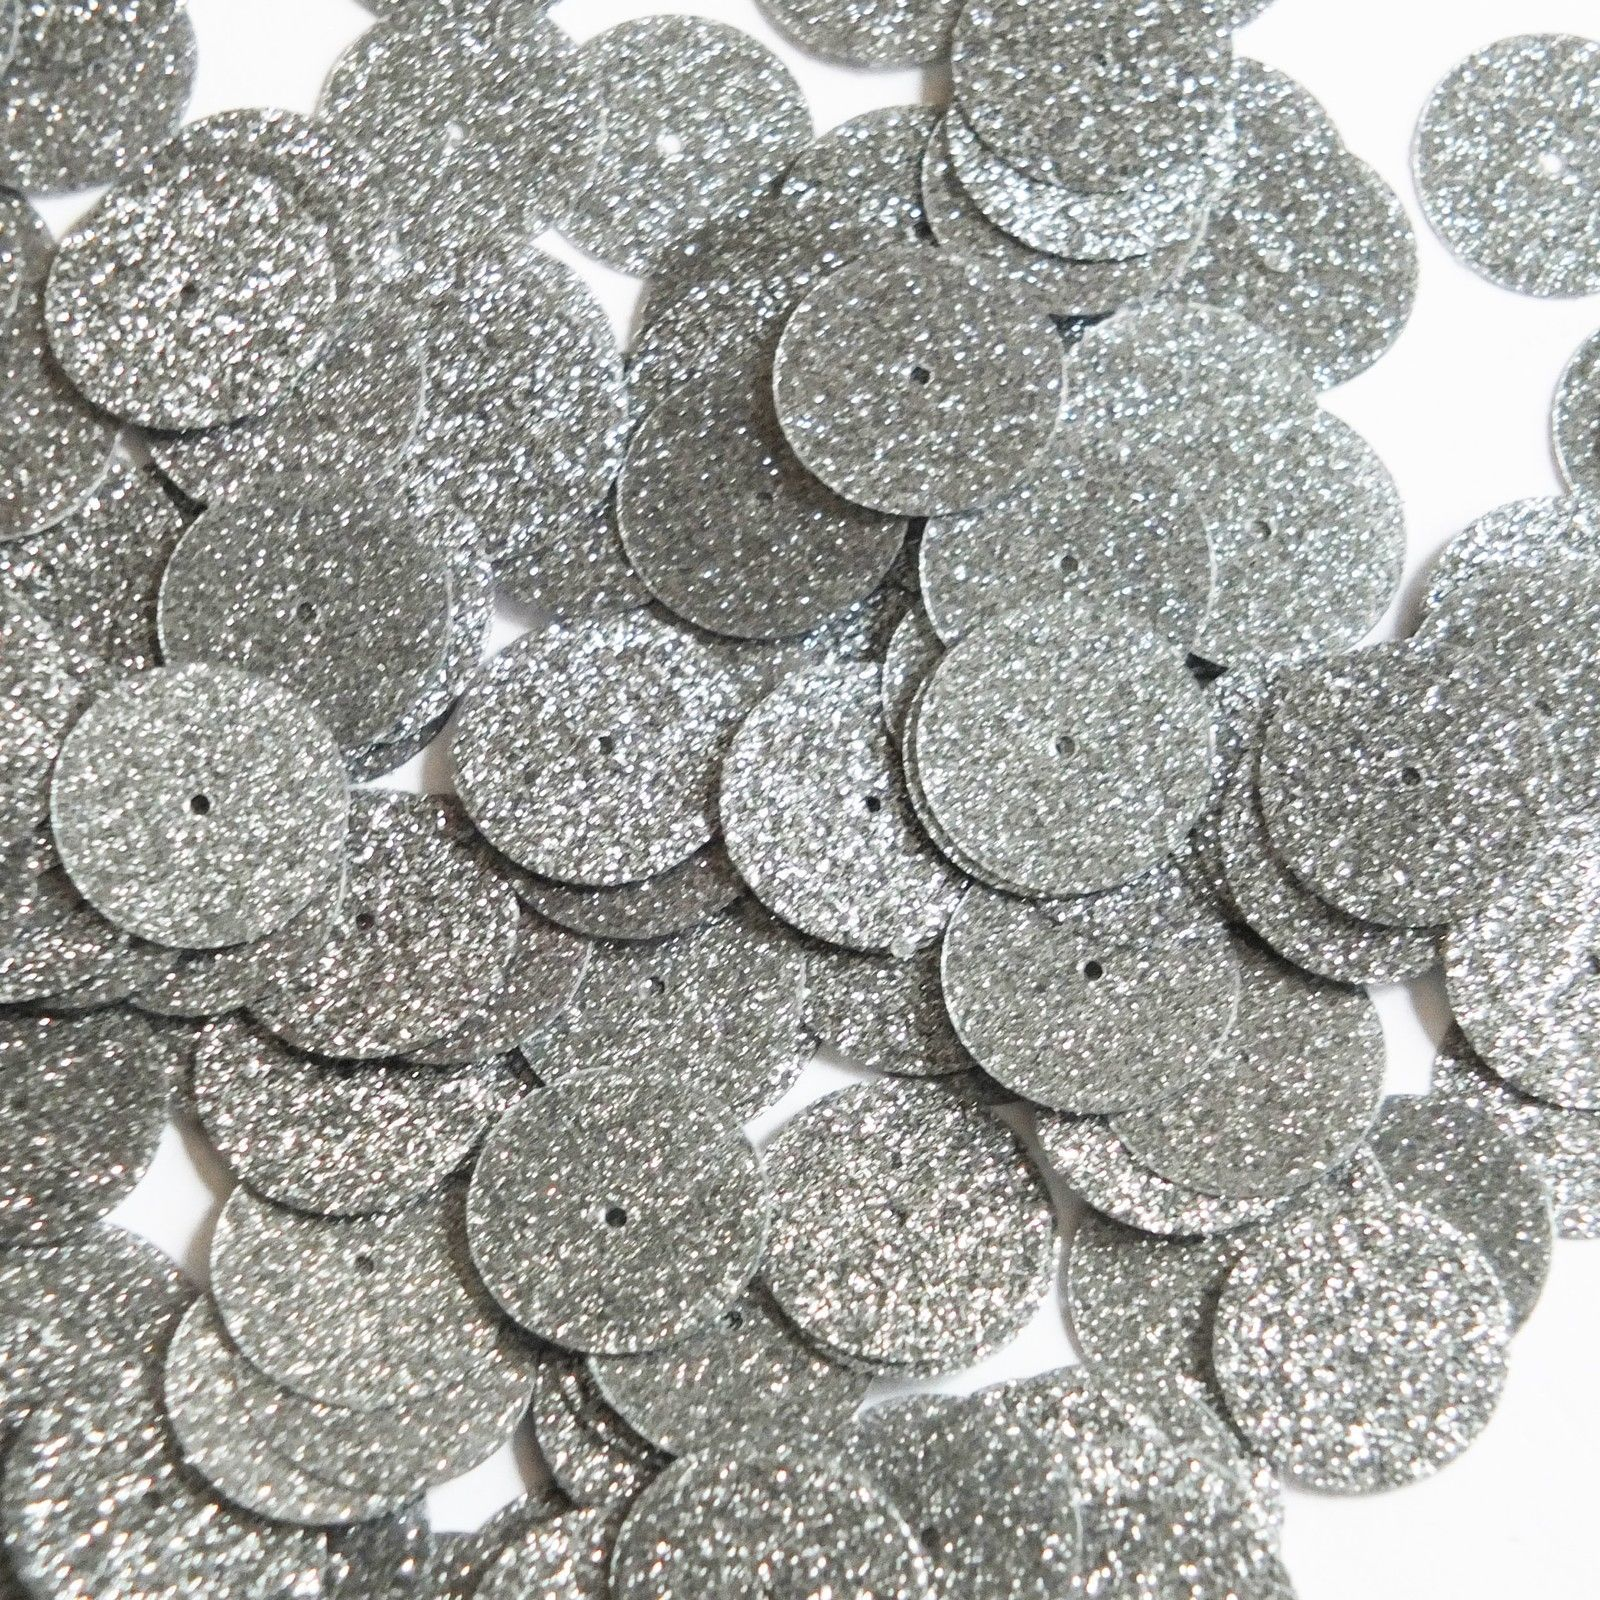 Navette Leaf Sequin 1.5 Crystal White Metallic Sparkle Glitter Texture Couture Paillettes